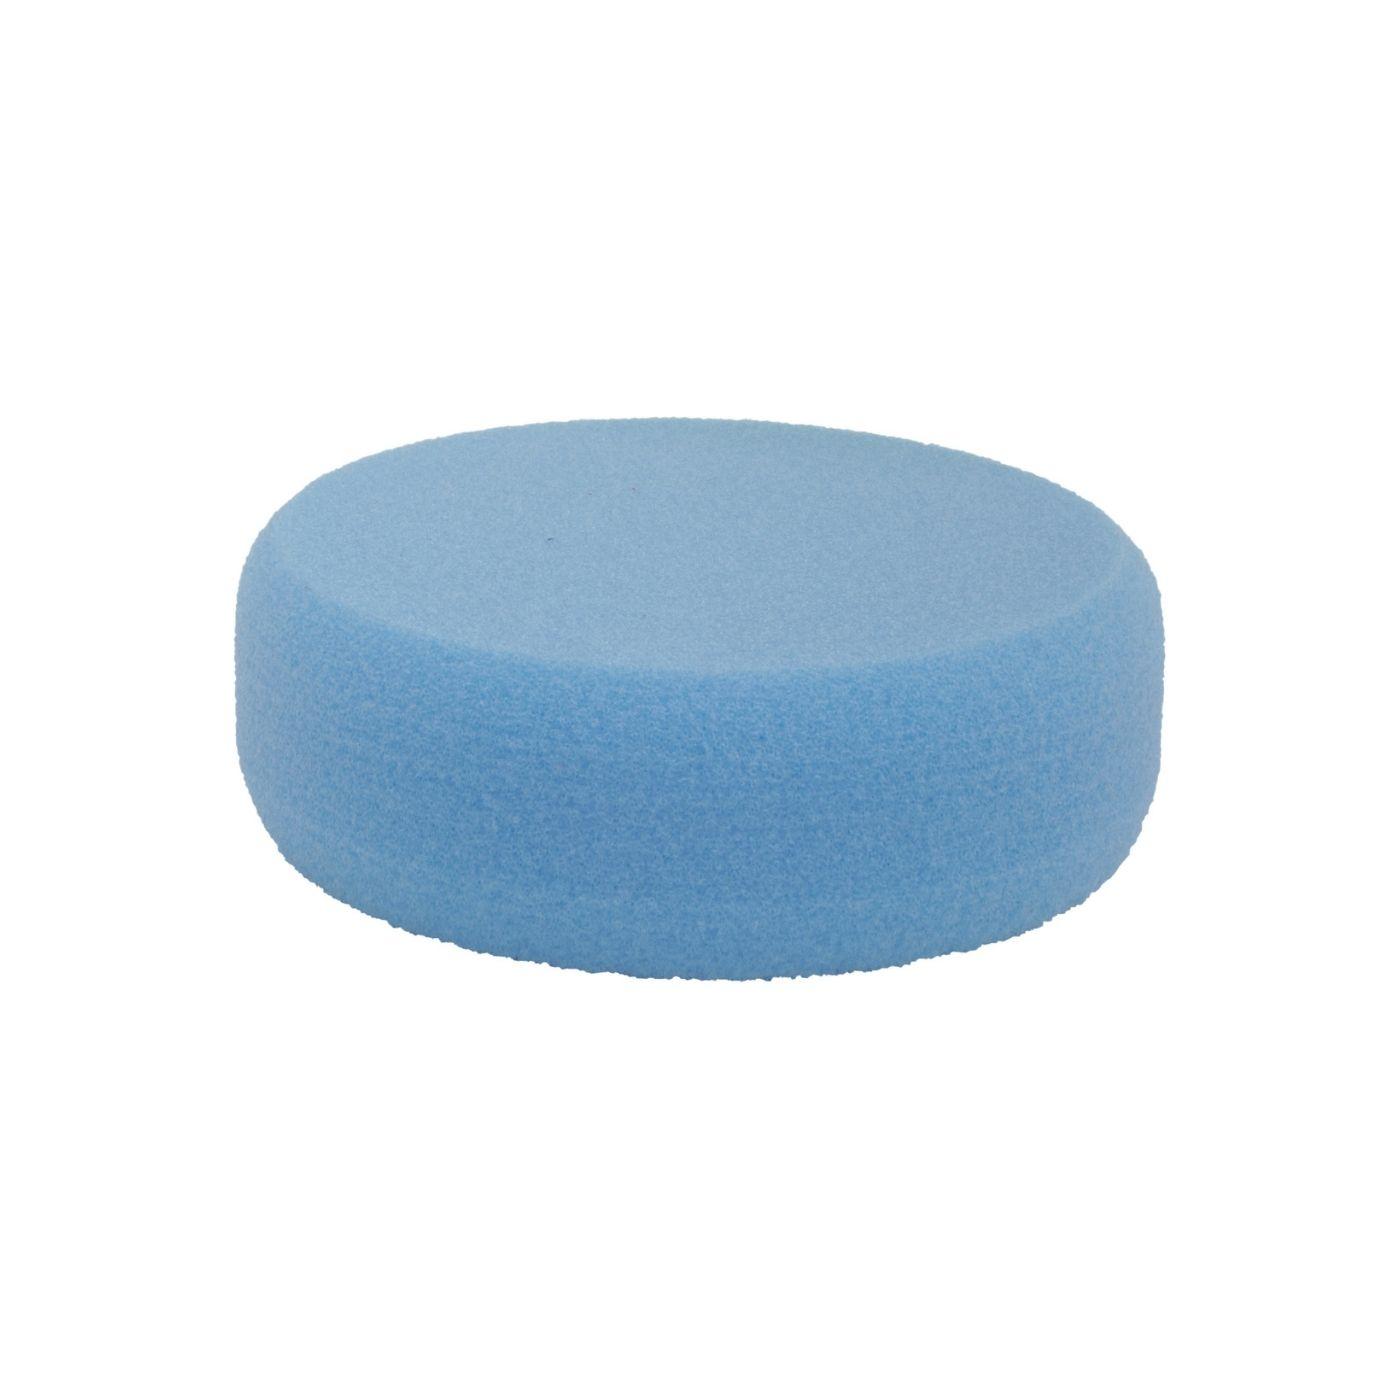 Skumrondell Turtle Wax, Blå